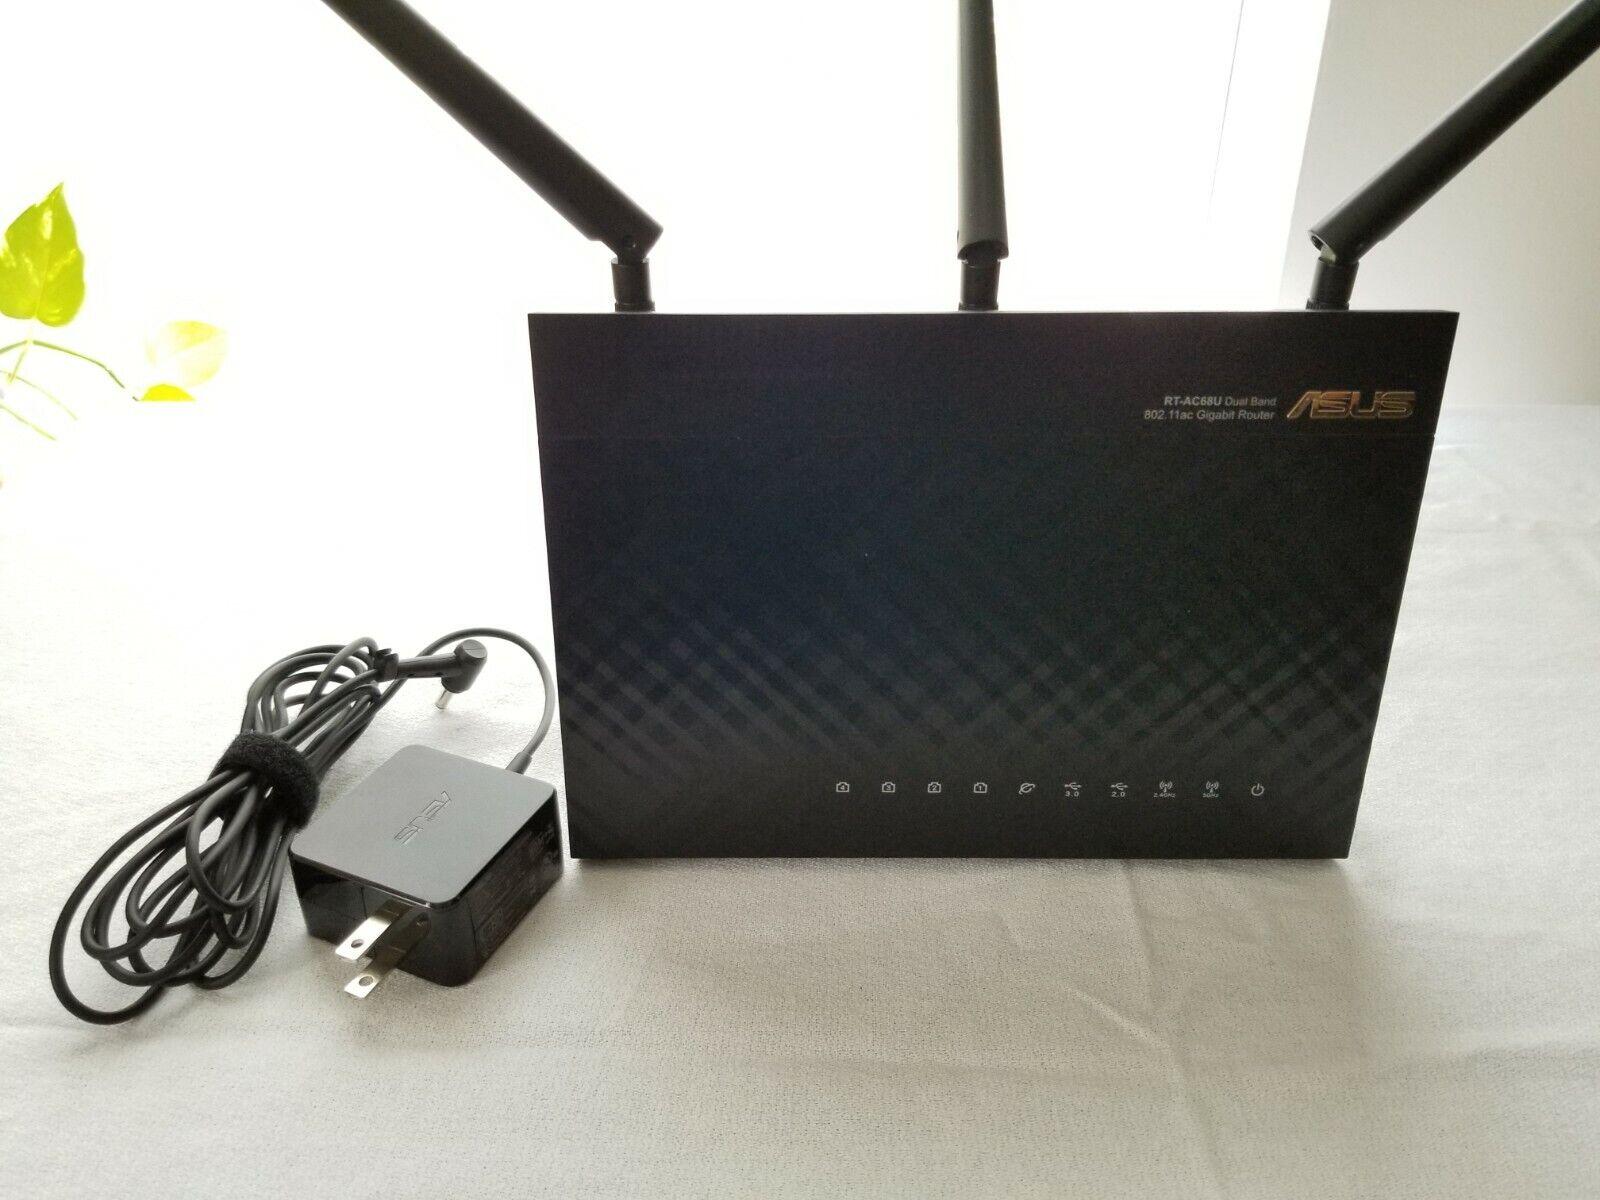 ASUS RT-AC68U AiMesh AC Router - Excellent Condition - $82.00